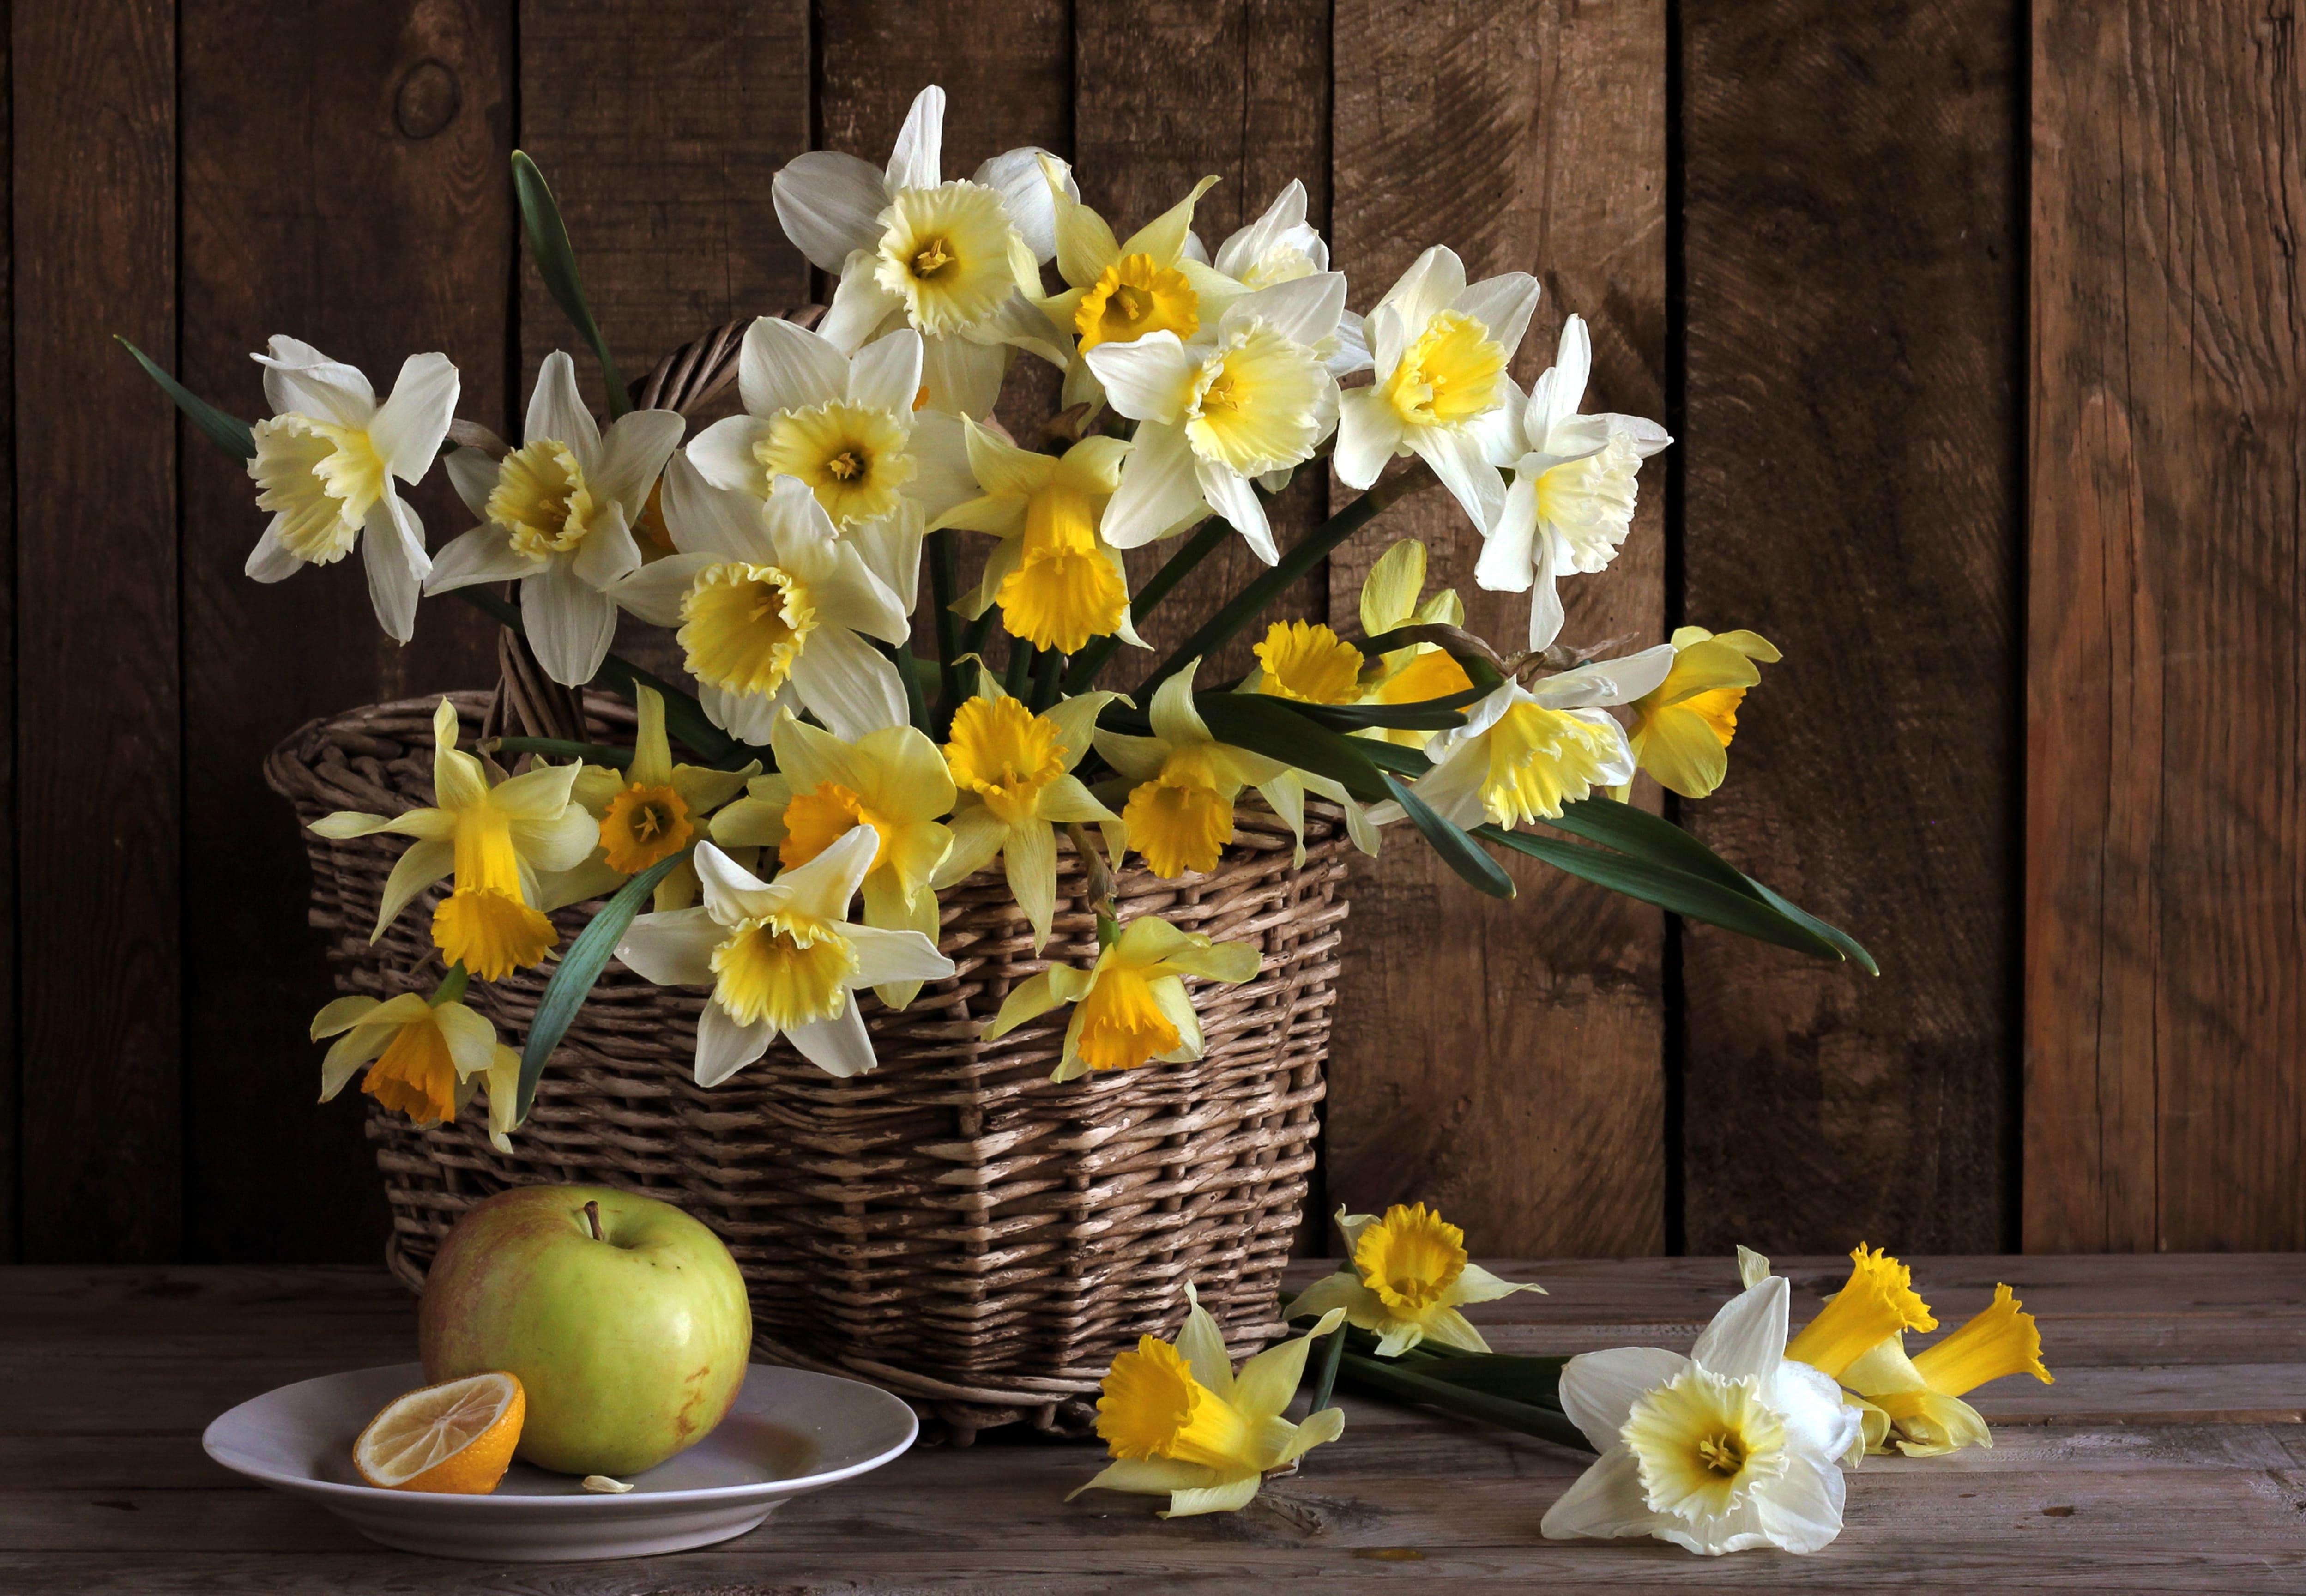 daffodils-photo-33